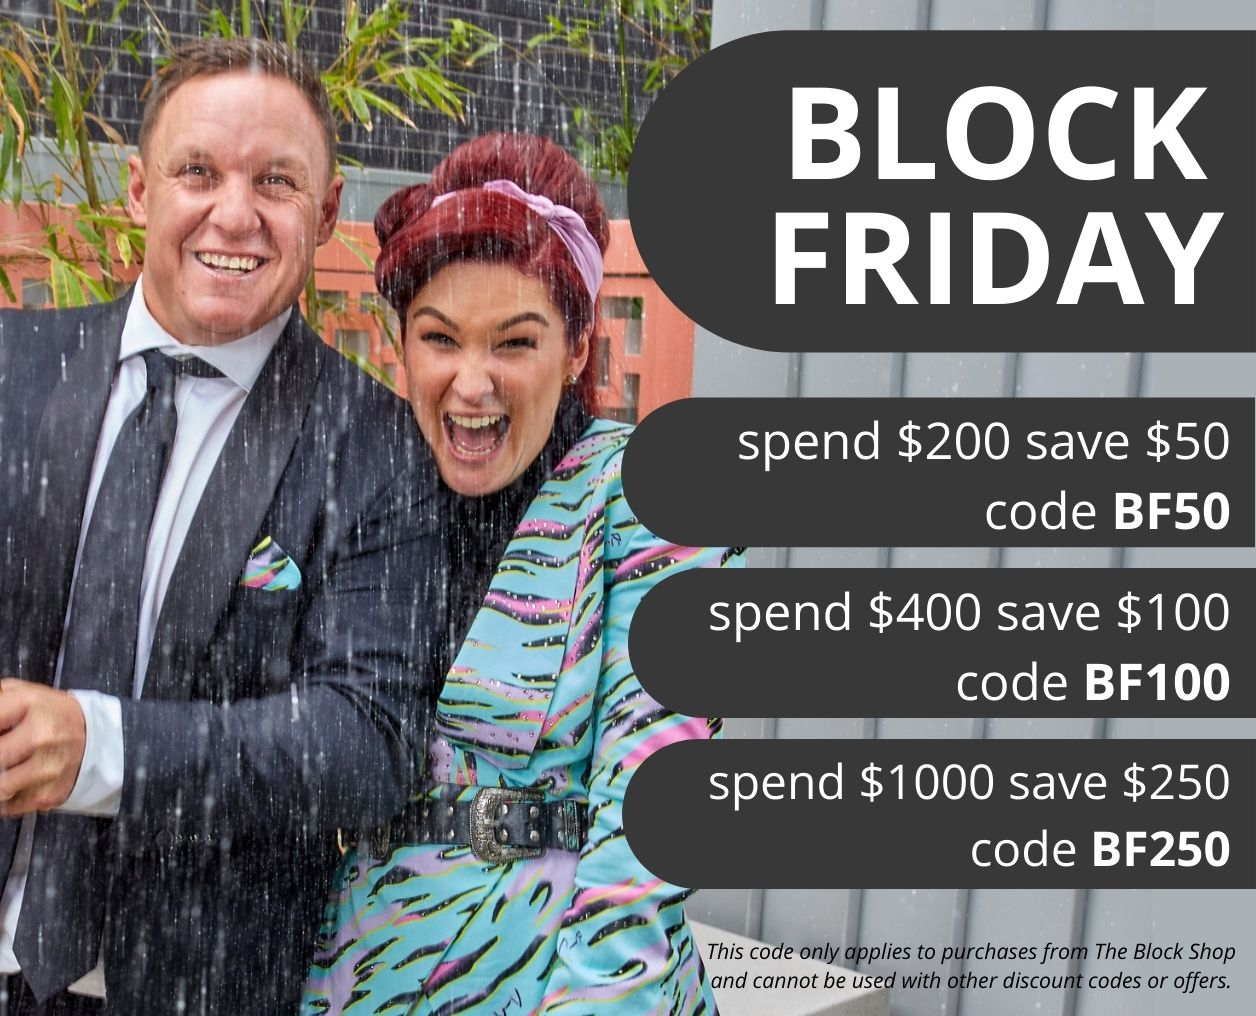 Block Friday